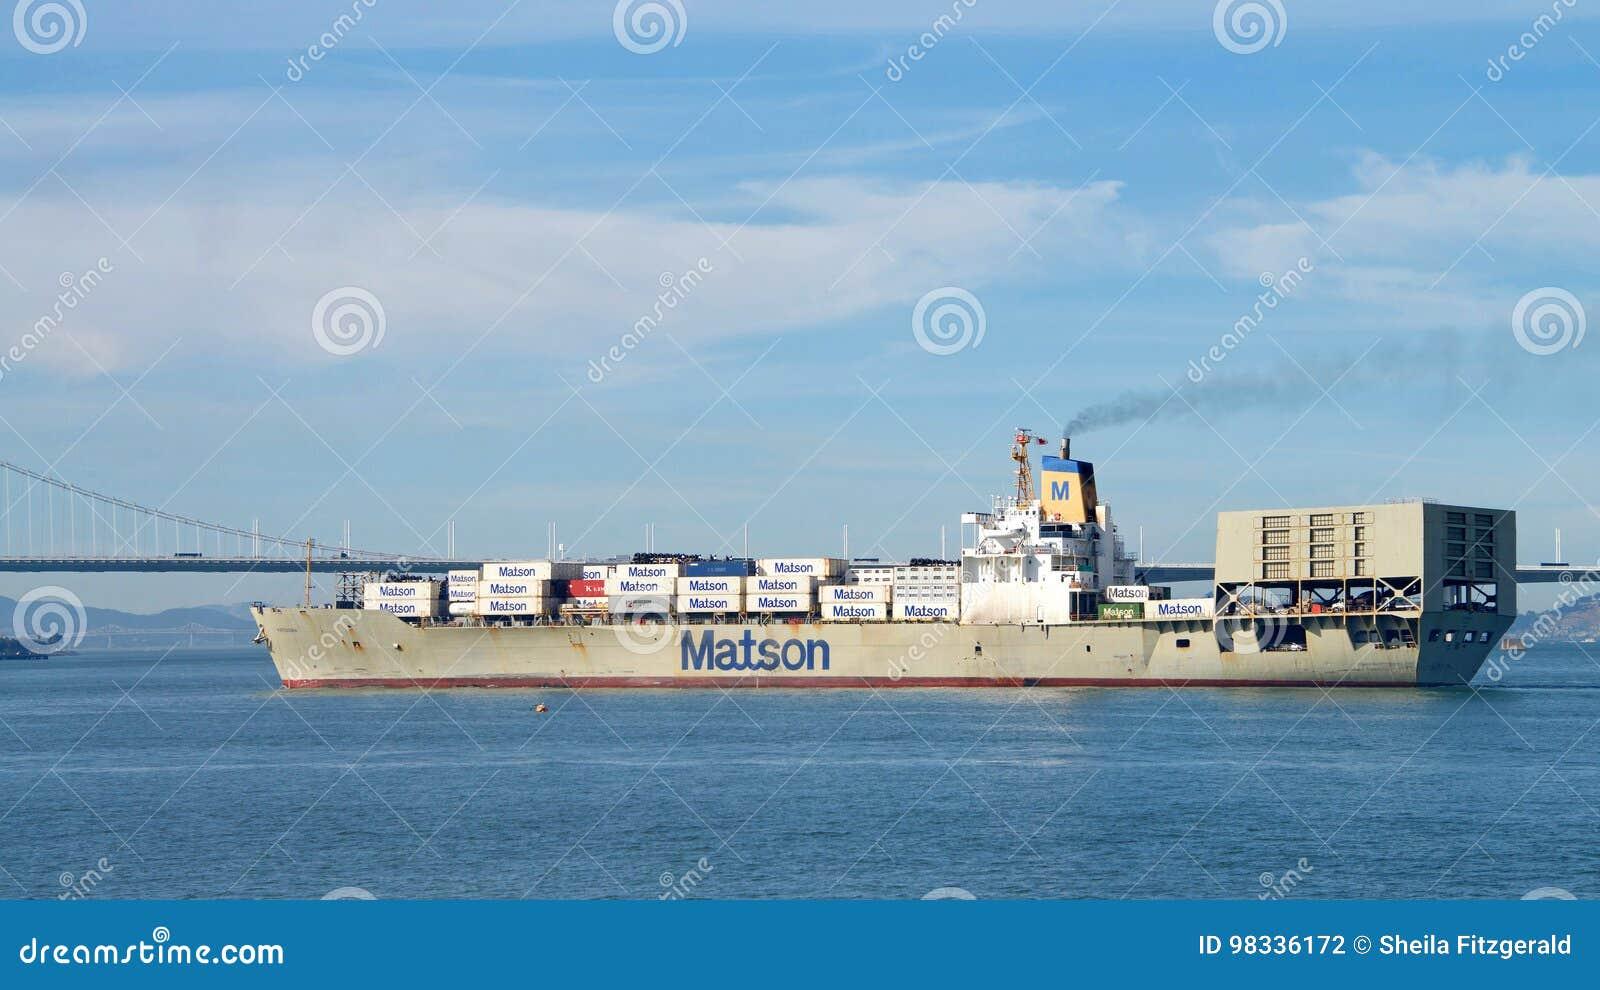 Matson Cargo Ship MATSONIA Departing The Port Of Oakland